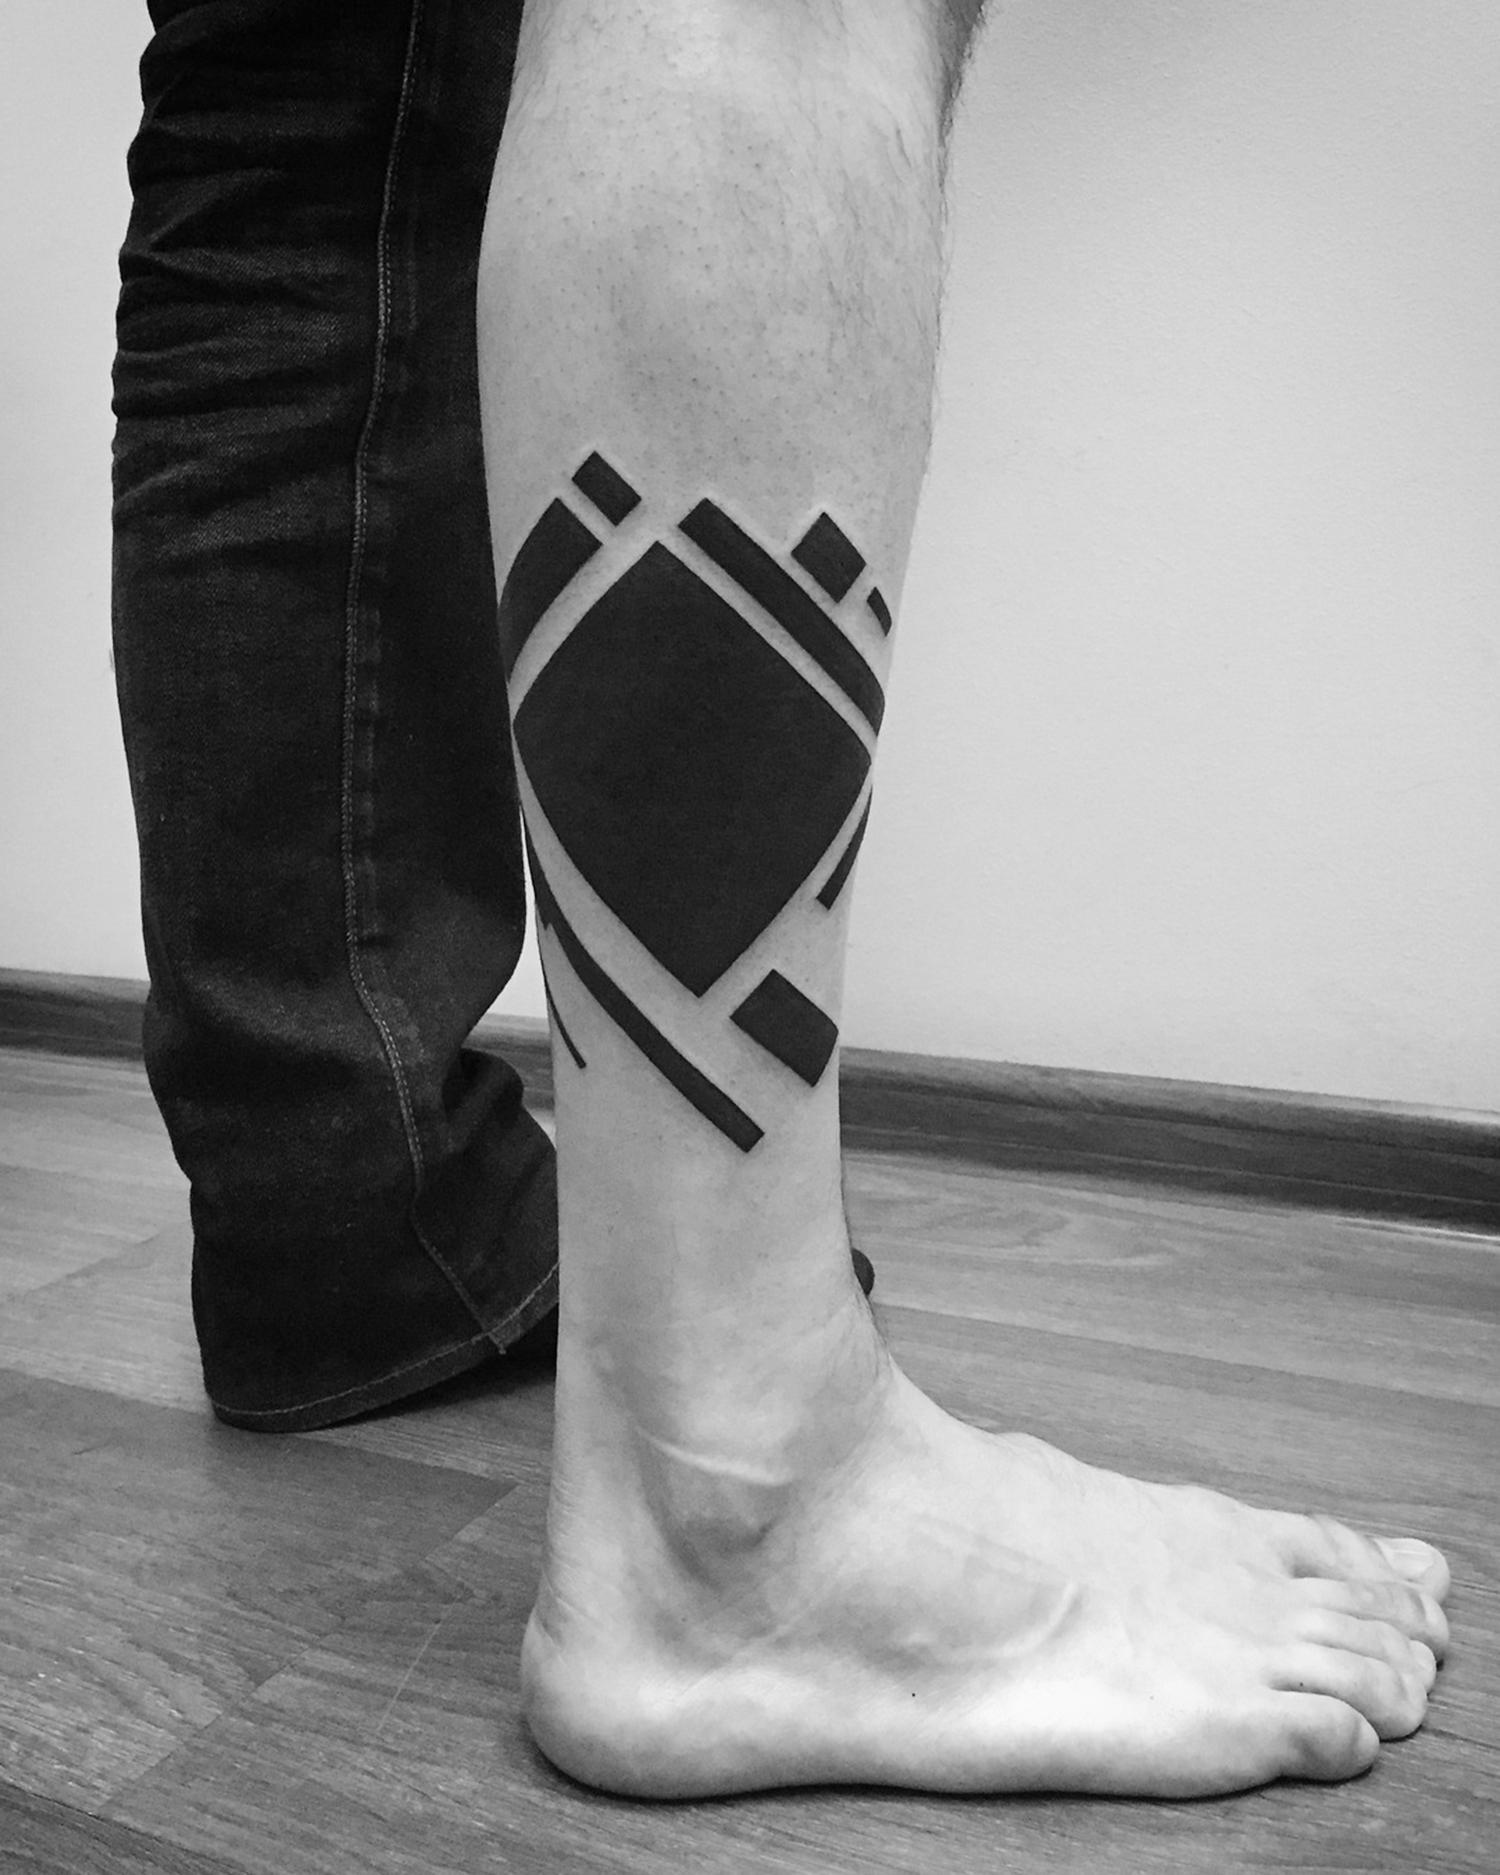 geometric blackwork tattoo on leg